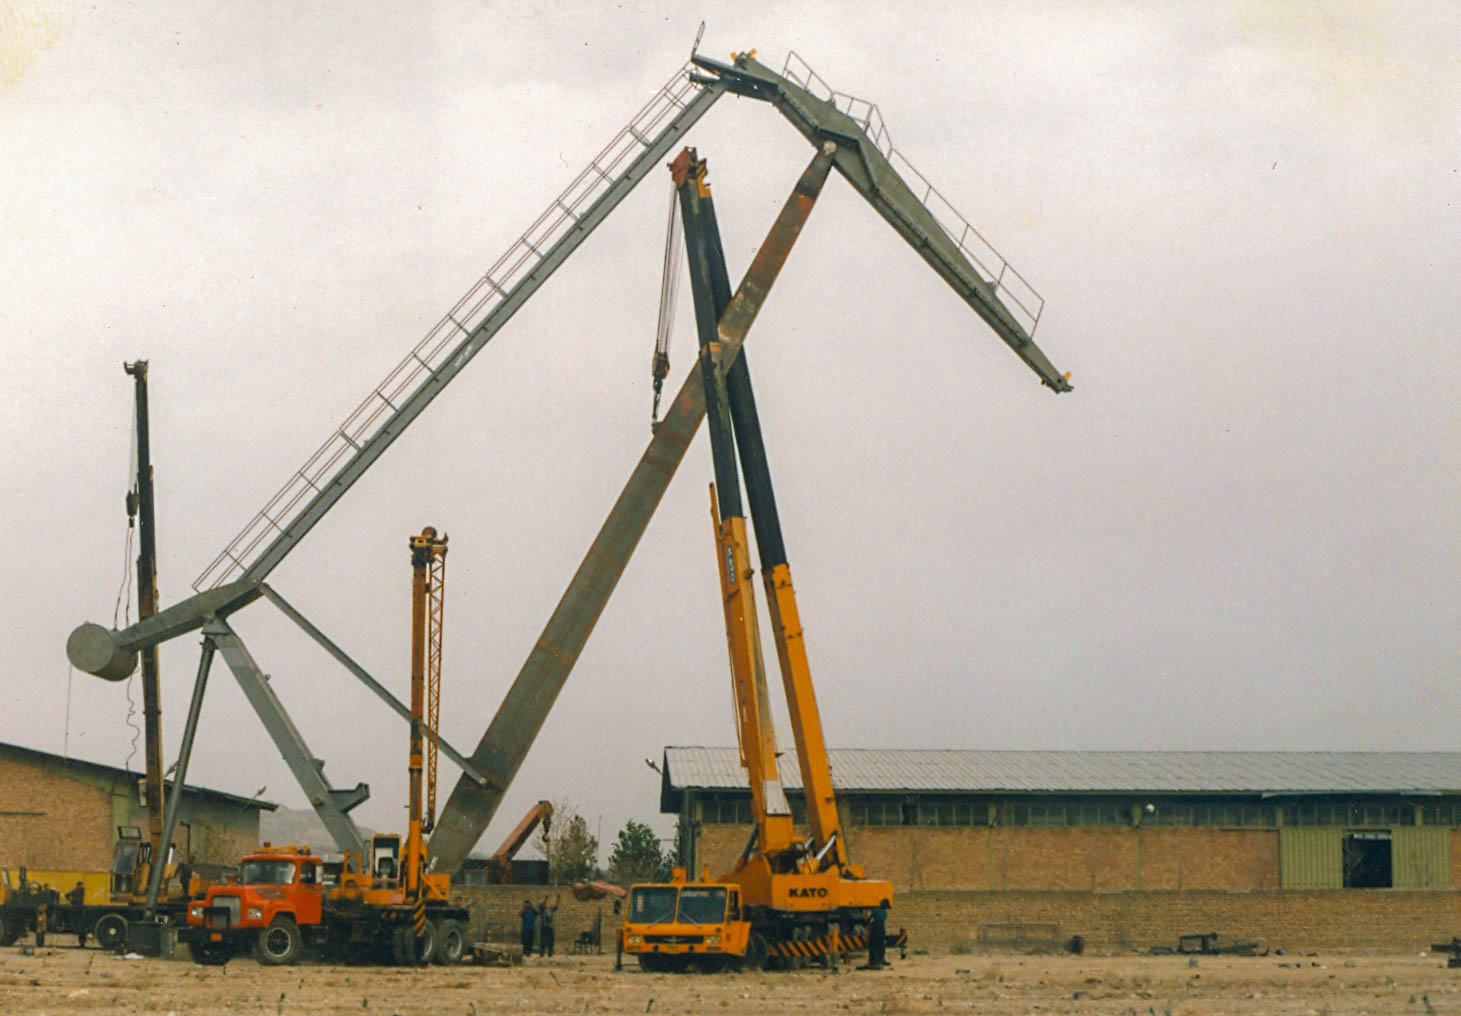 Bandar Abbas Port luffing crane